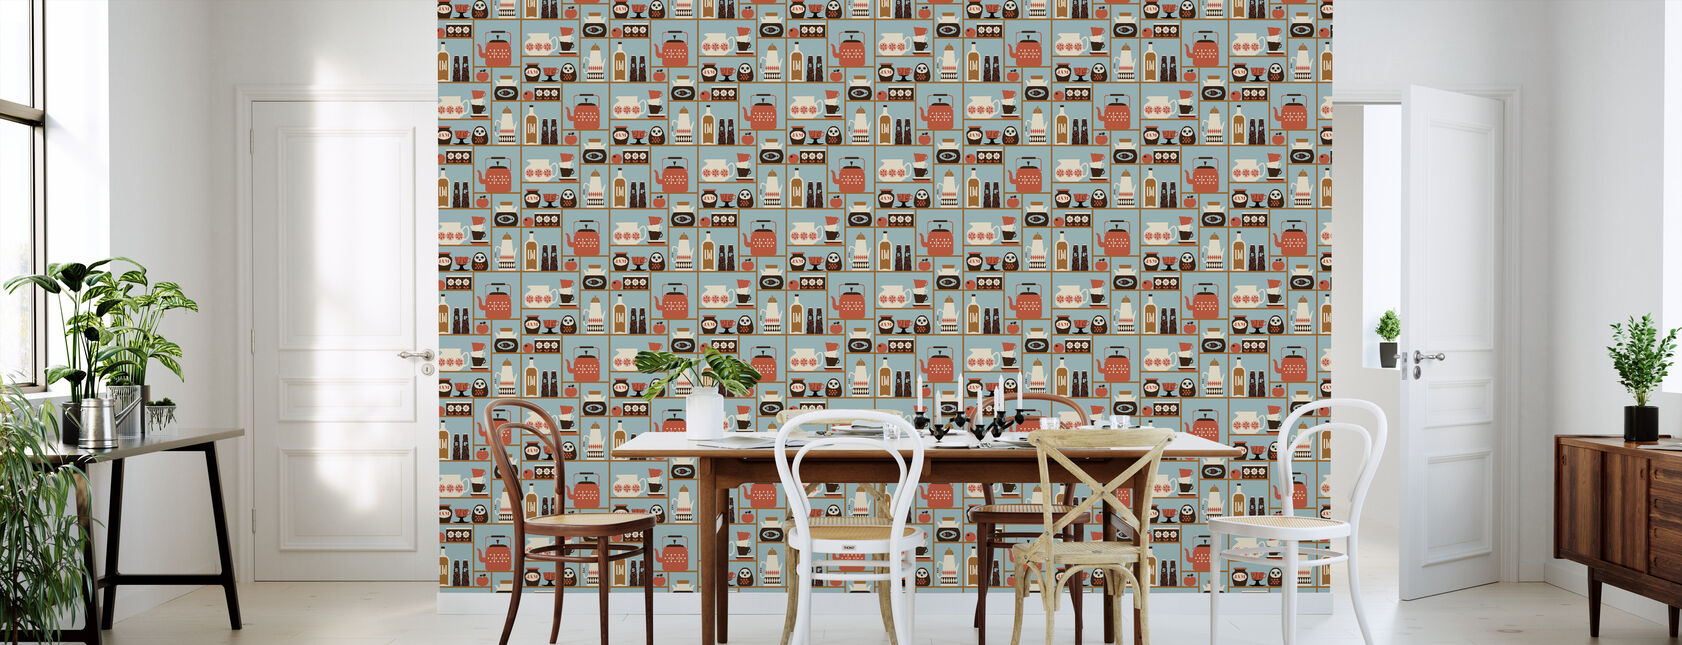 Kitchen Shelves - Light Blue - Wallpaper - Kitchen